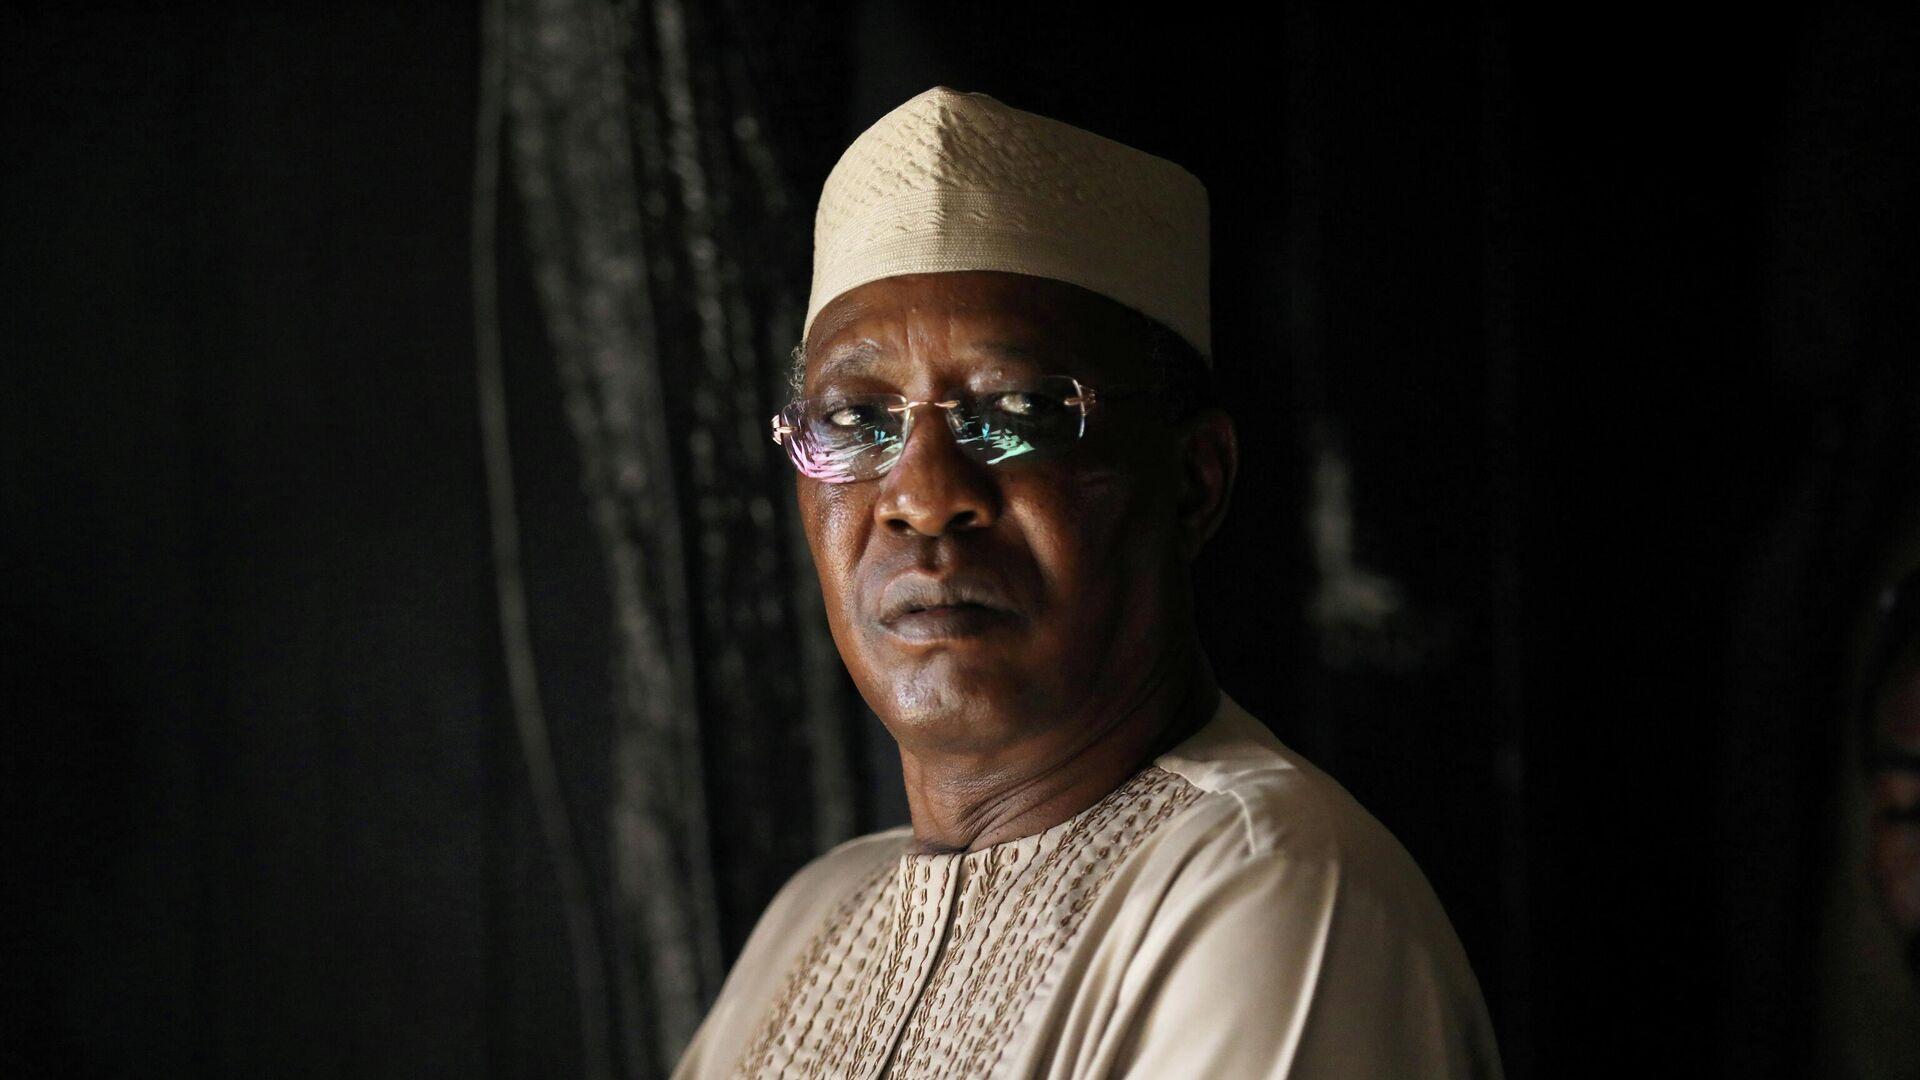 El presidente de Chad, Idriss Deby - Sputnik Mundo, 1920, 20.04.2021